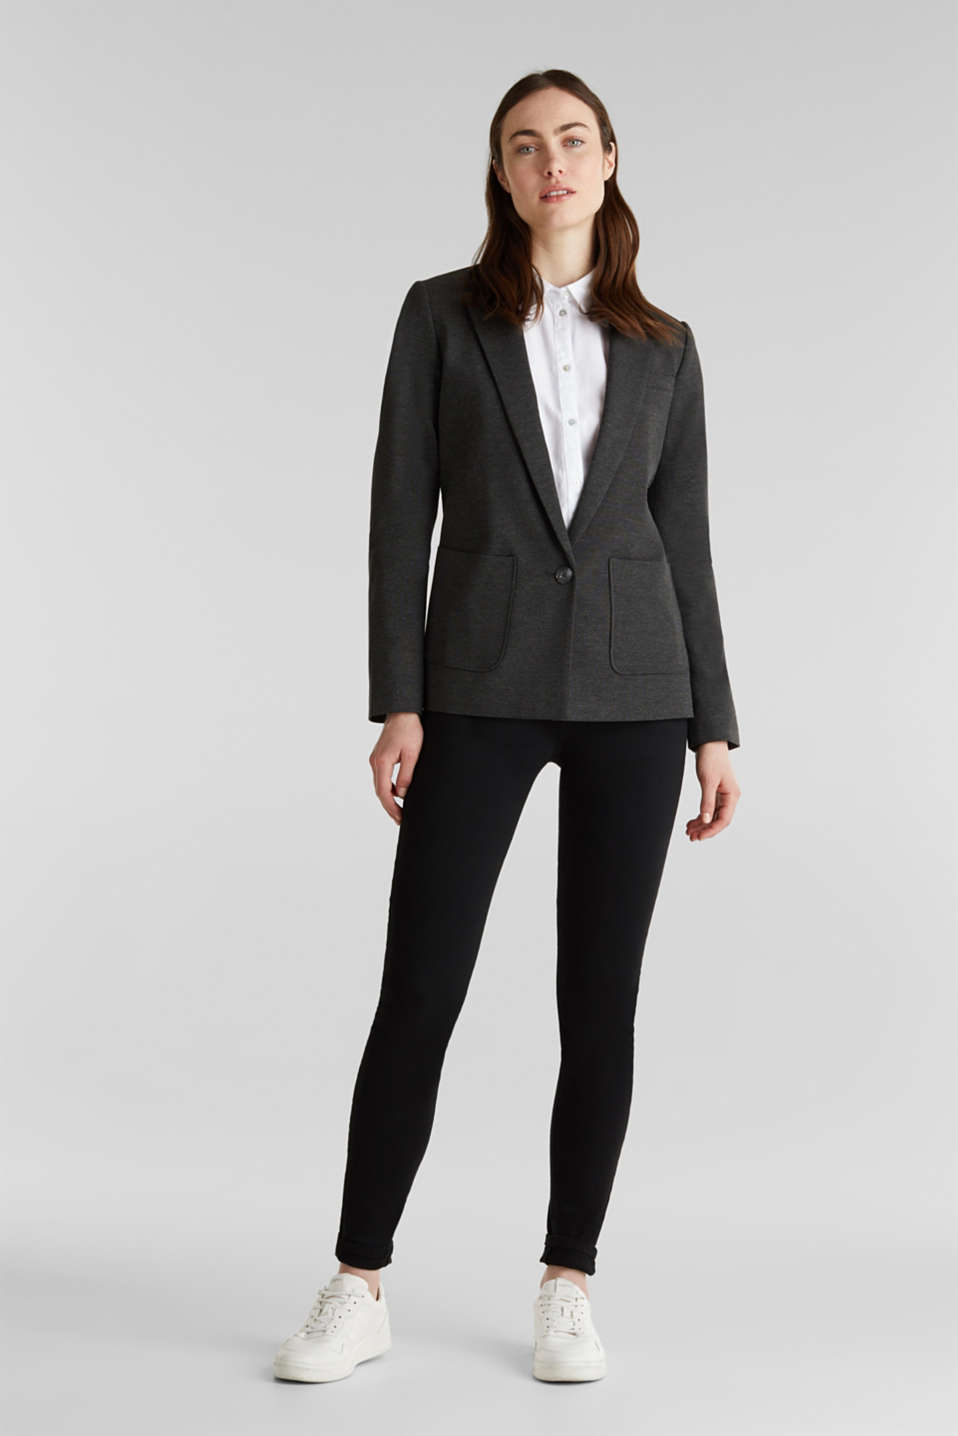 Stretch jersey blazer with pockets, DARK GREY, detail image number 1